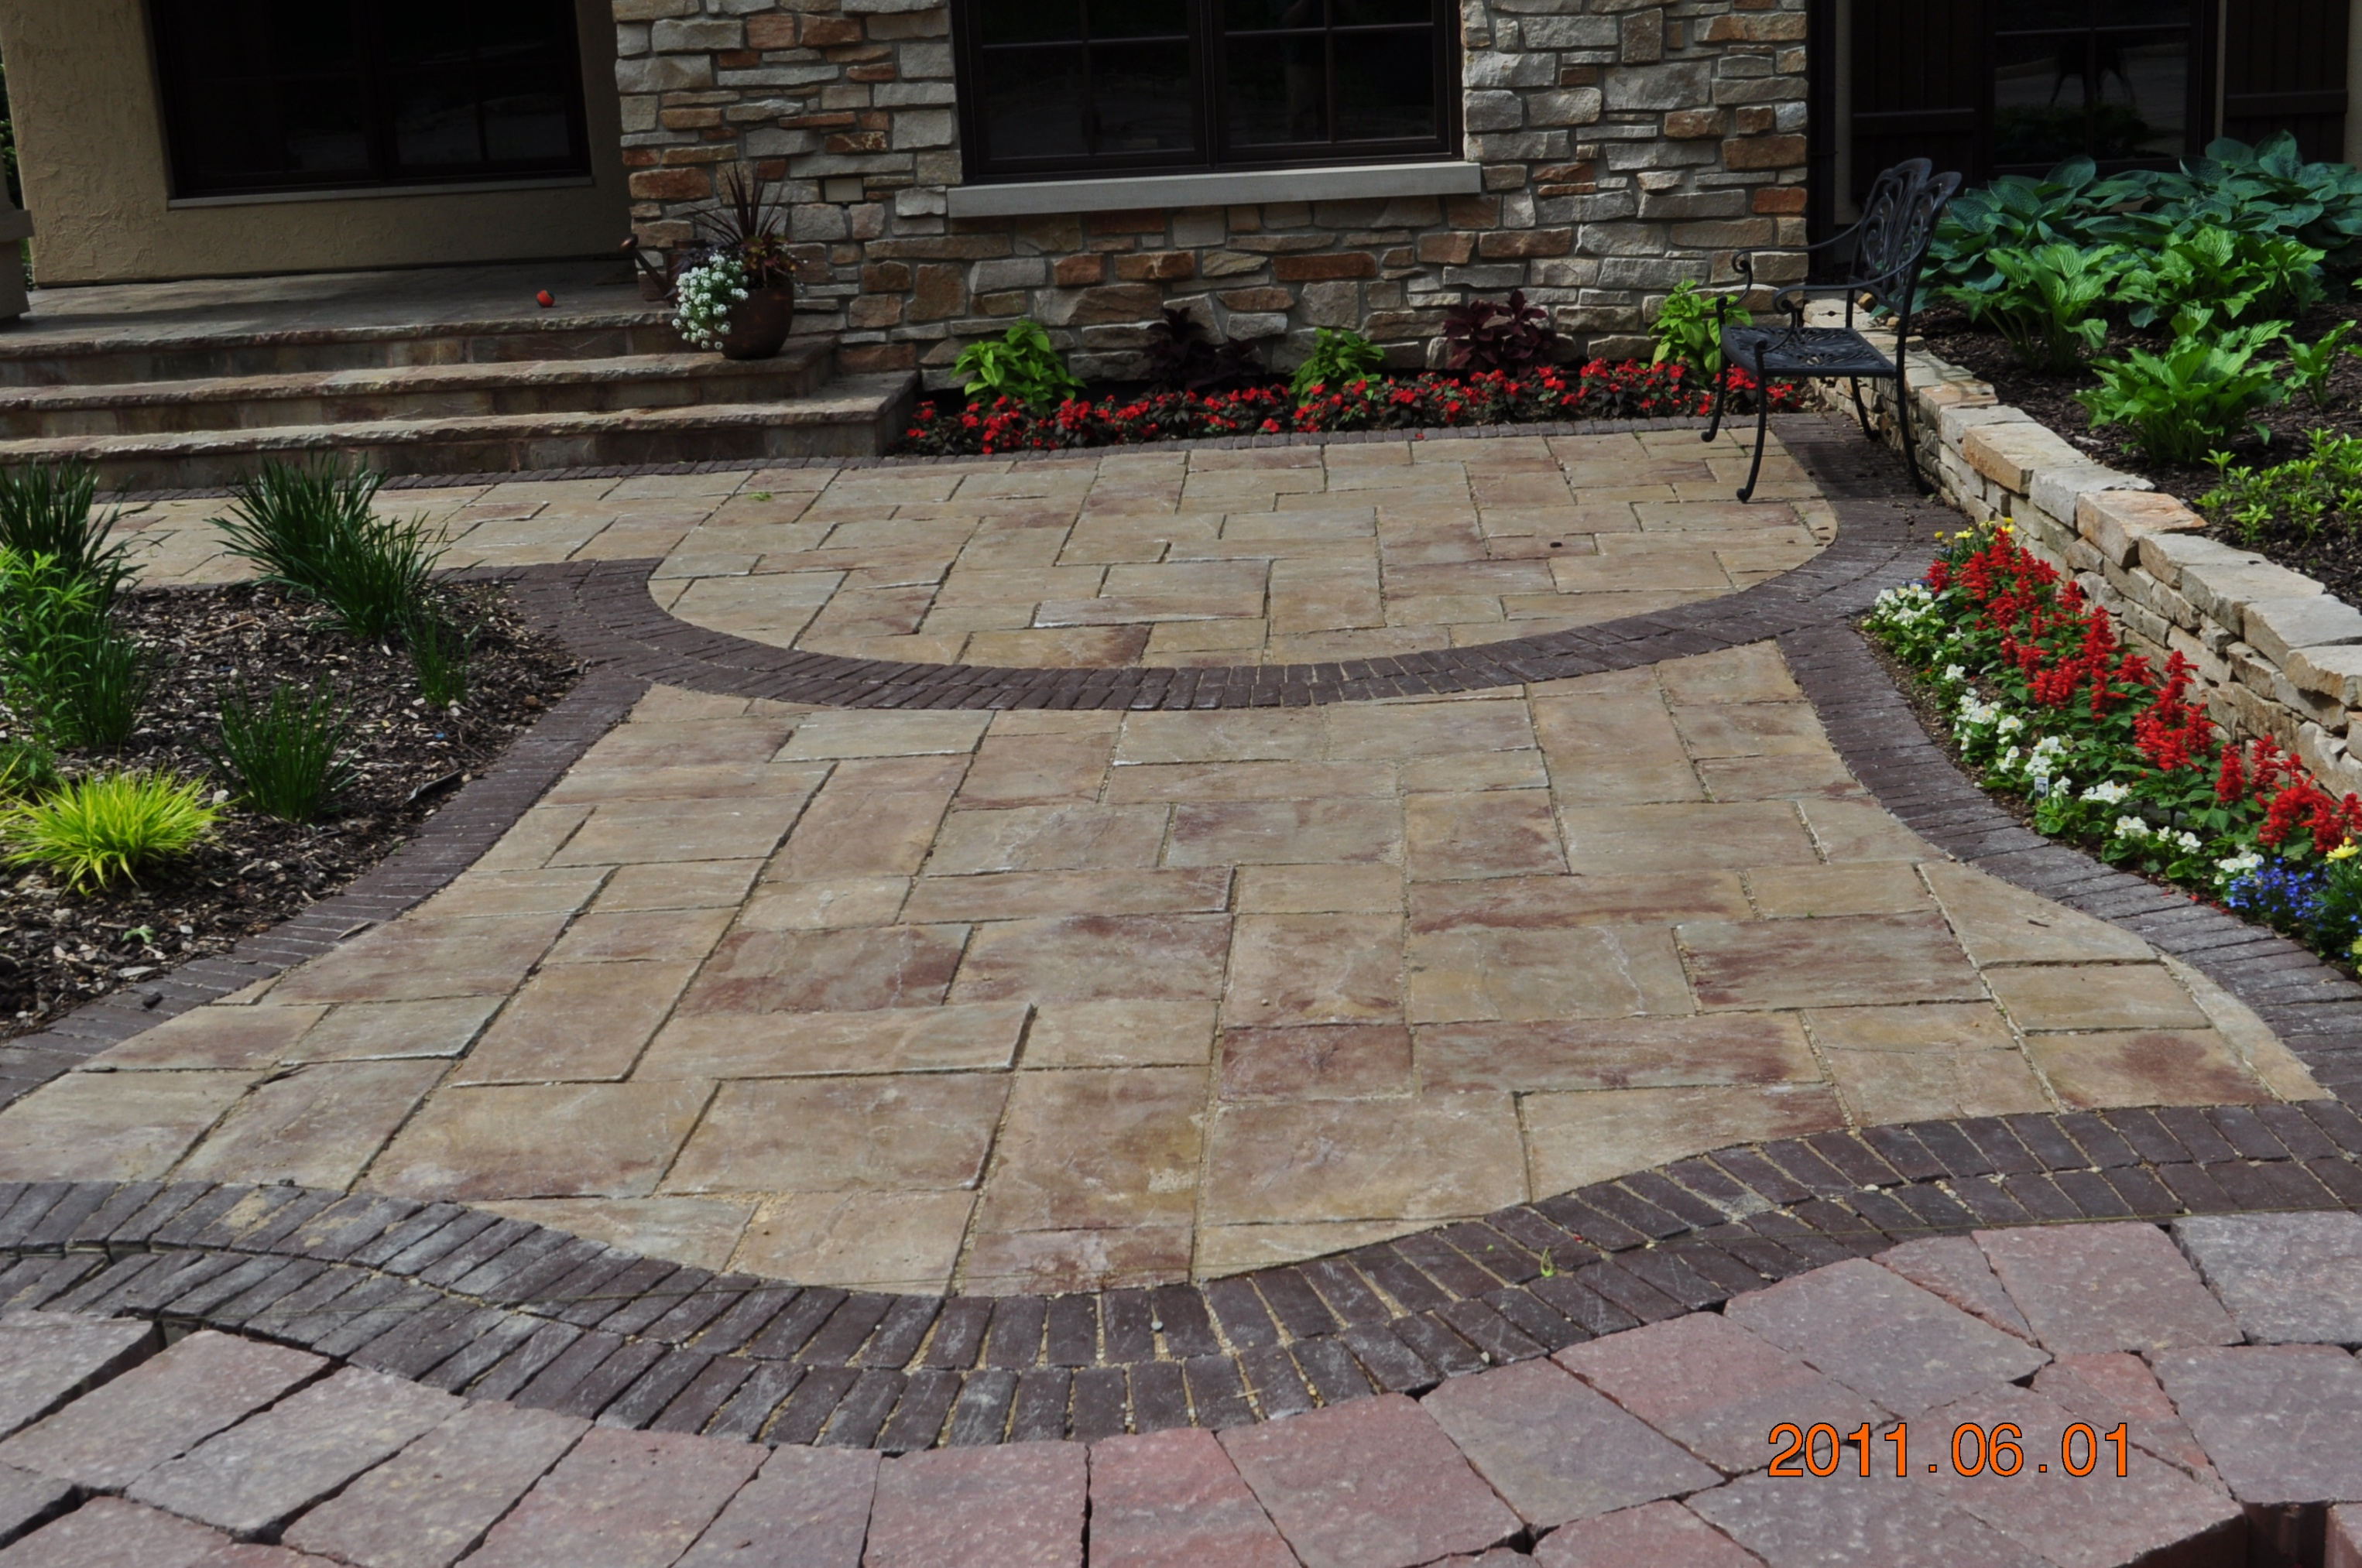 Rockford Brick Paver Landscape Features - Brick paver ... on Brick Paver Patio Designs  id=27299